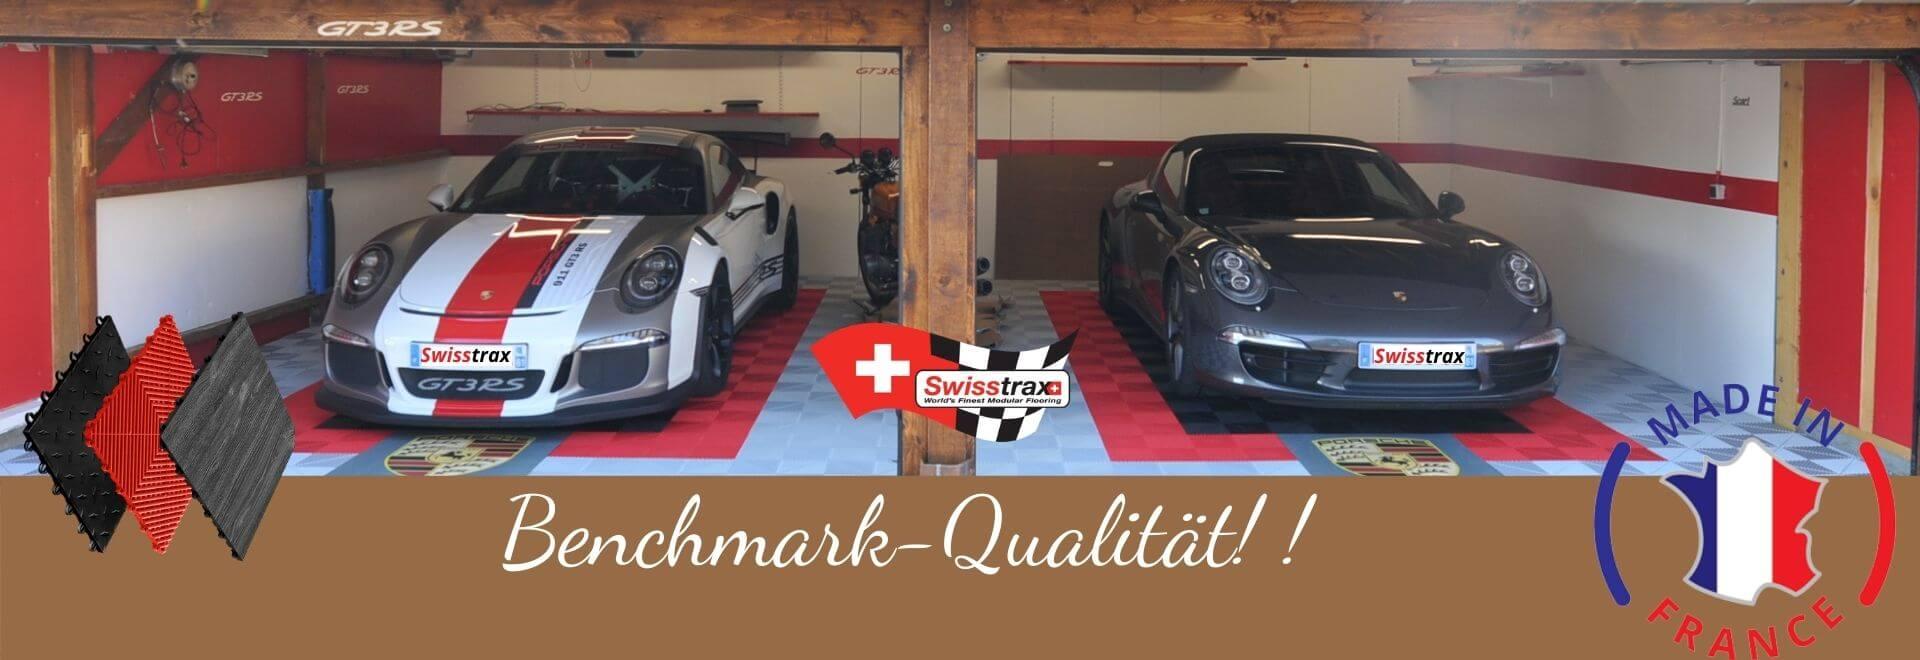 Benchmark-Qualität-swisstrax-europa